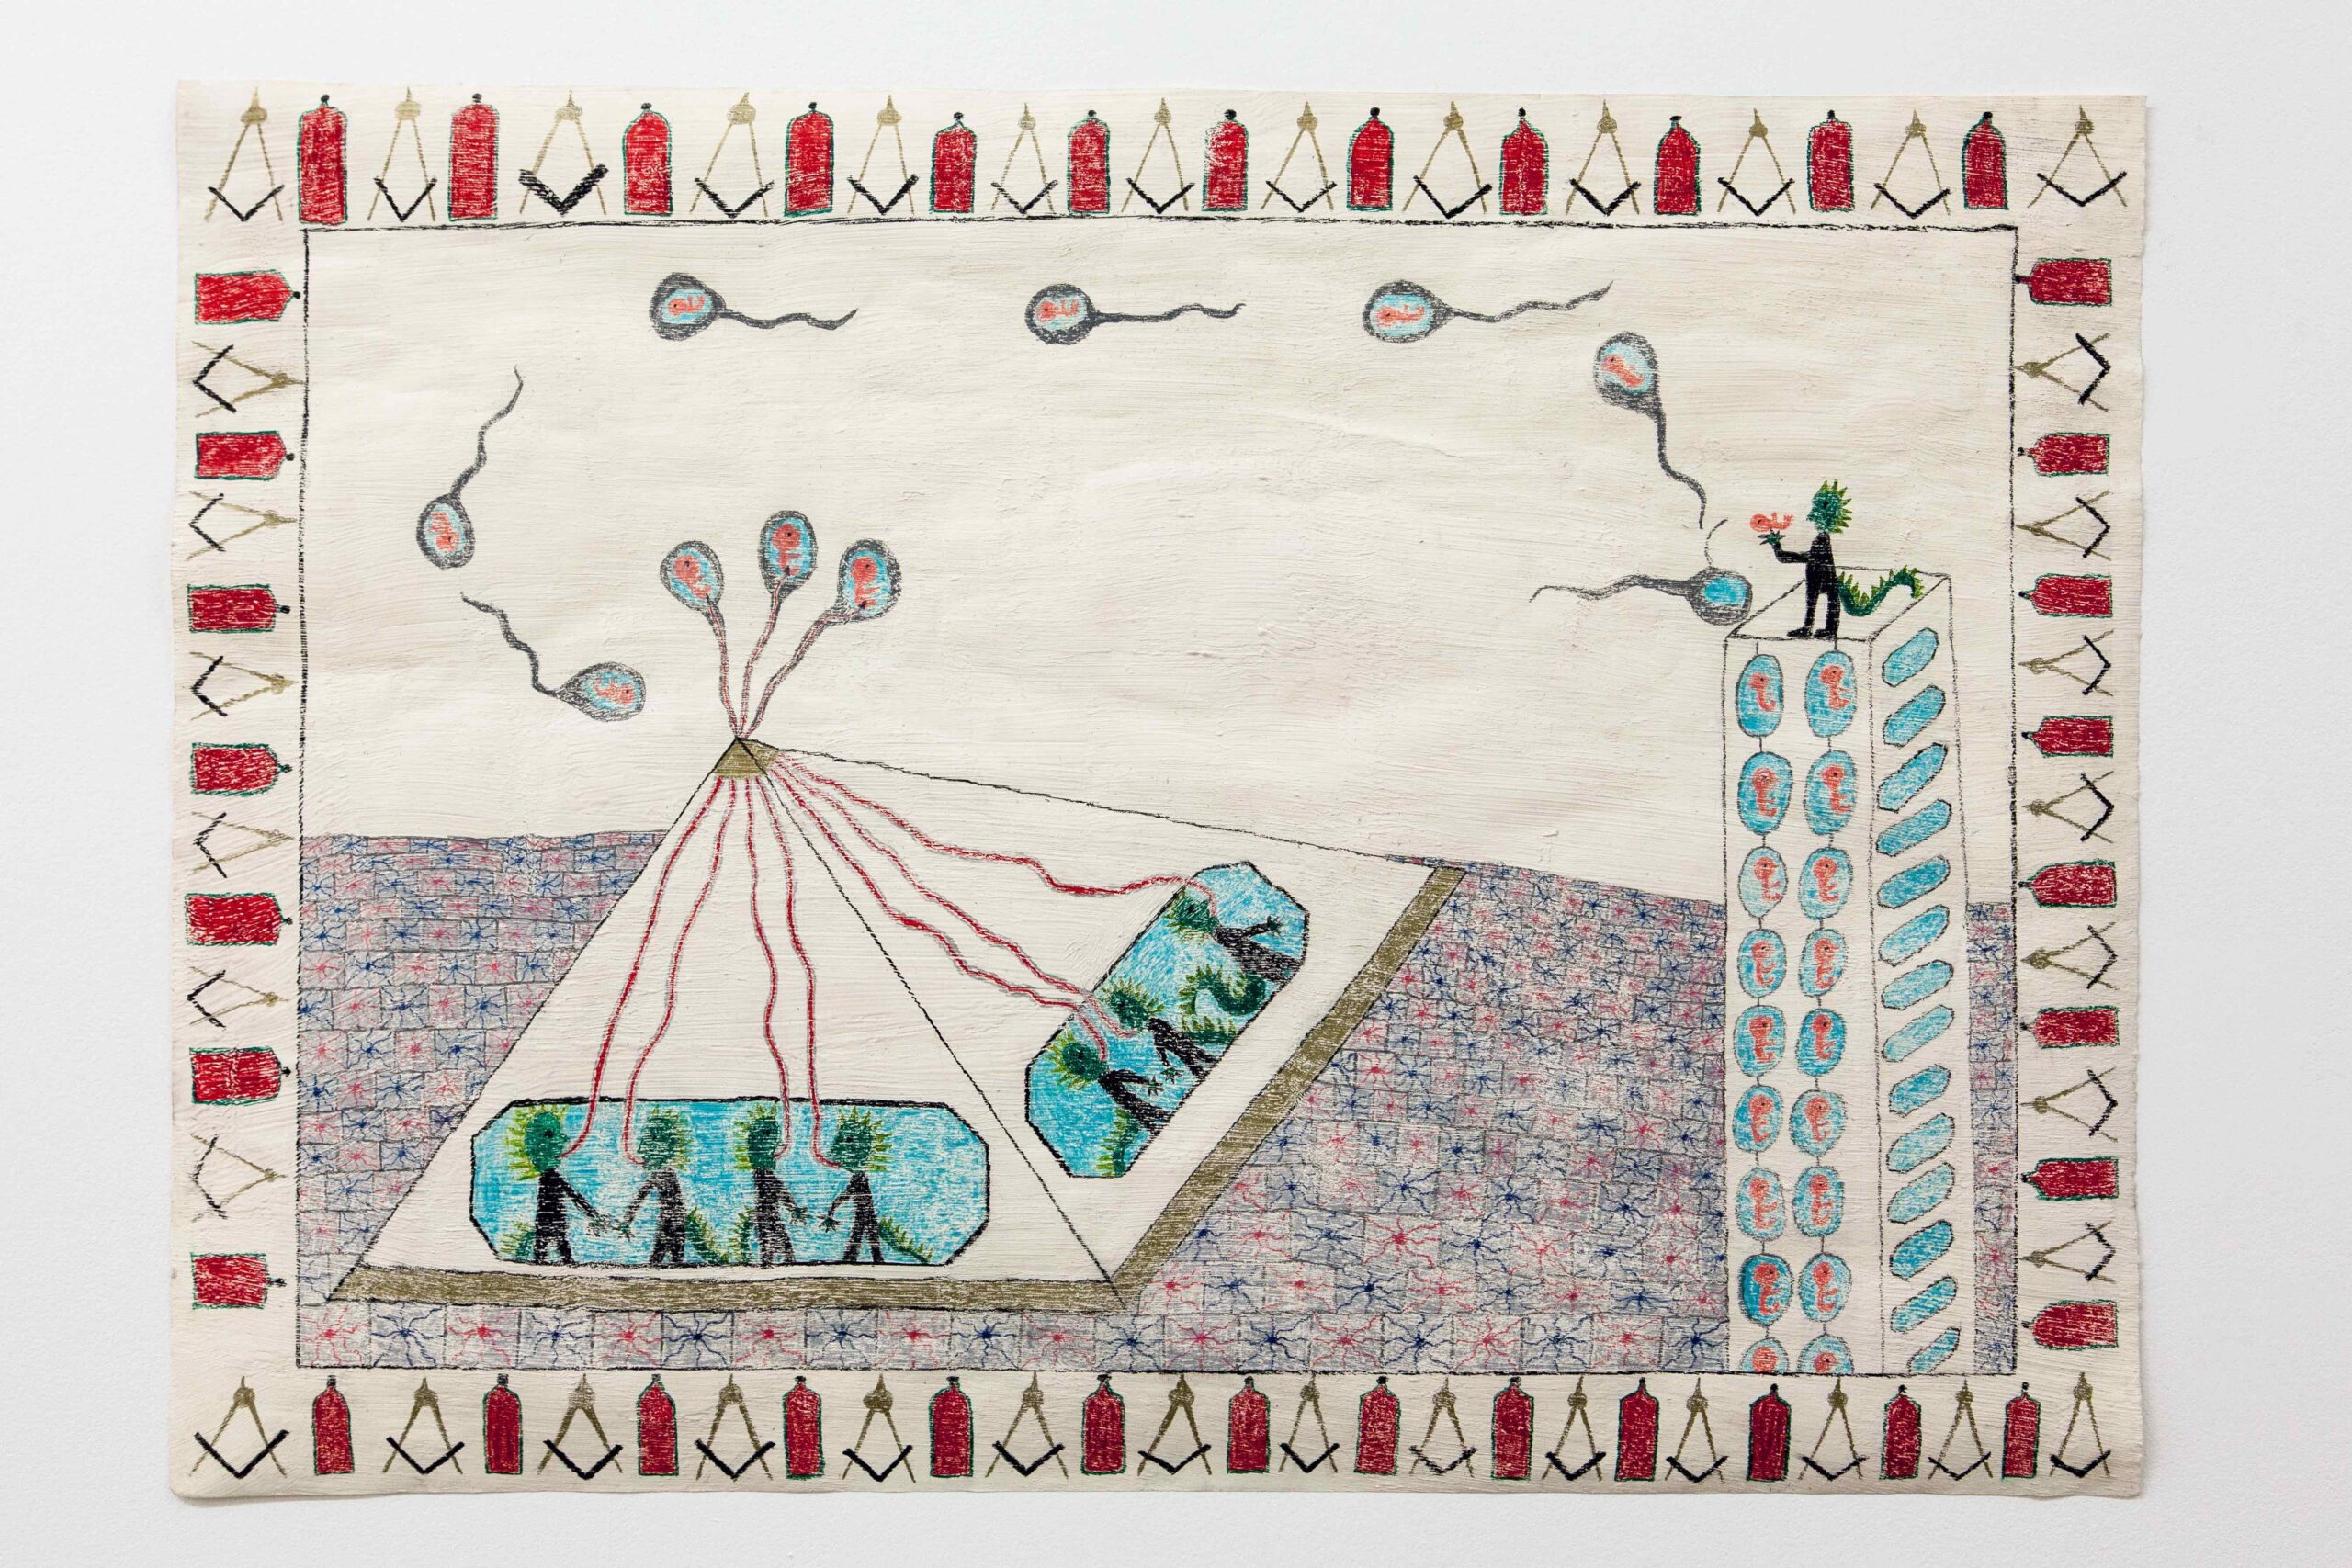 Conspiracy series: Reptilian elite, Crayon, Acrystal on Paper, 85 x 60 cm, 2021